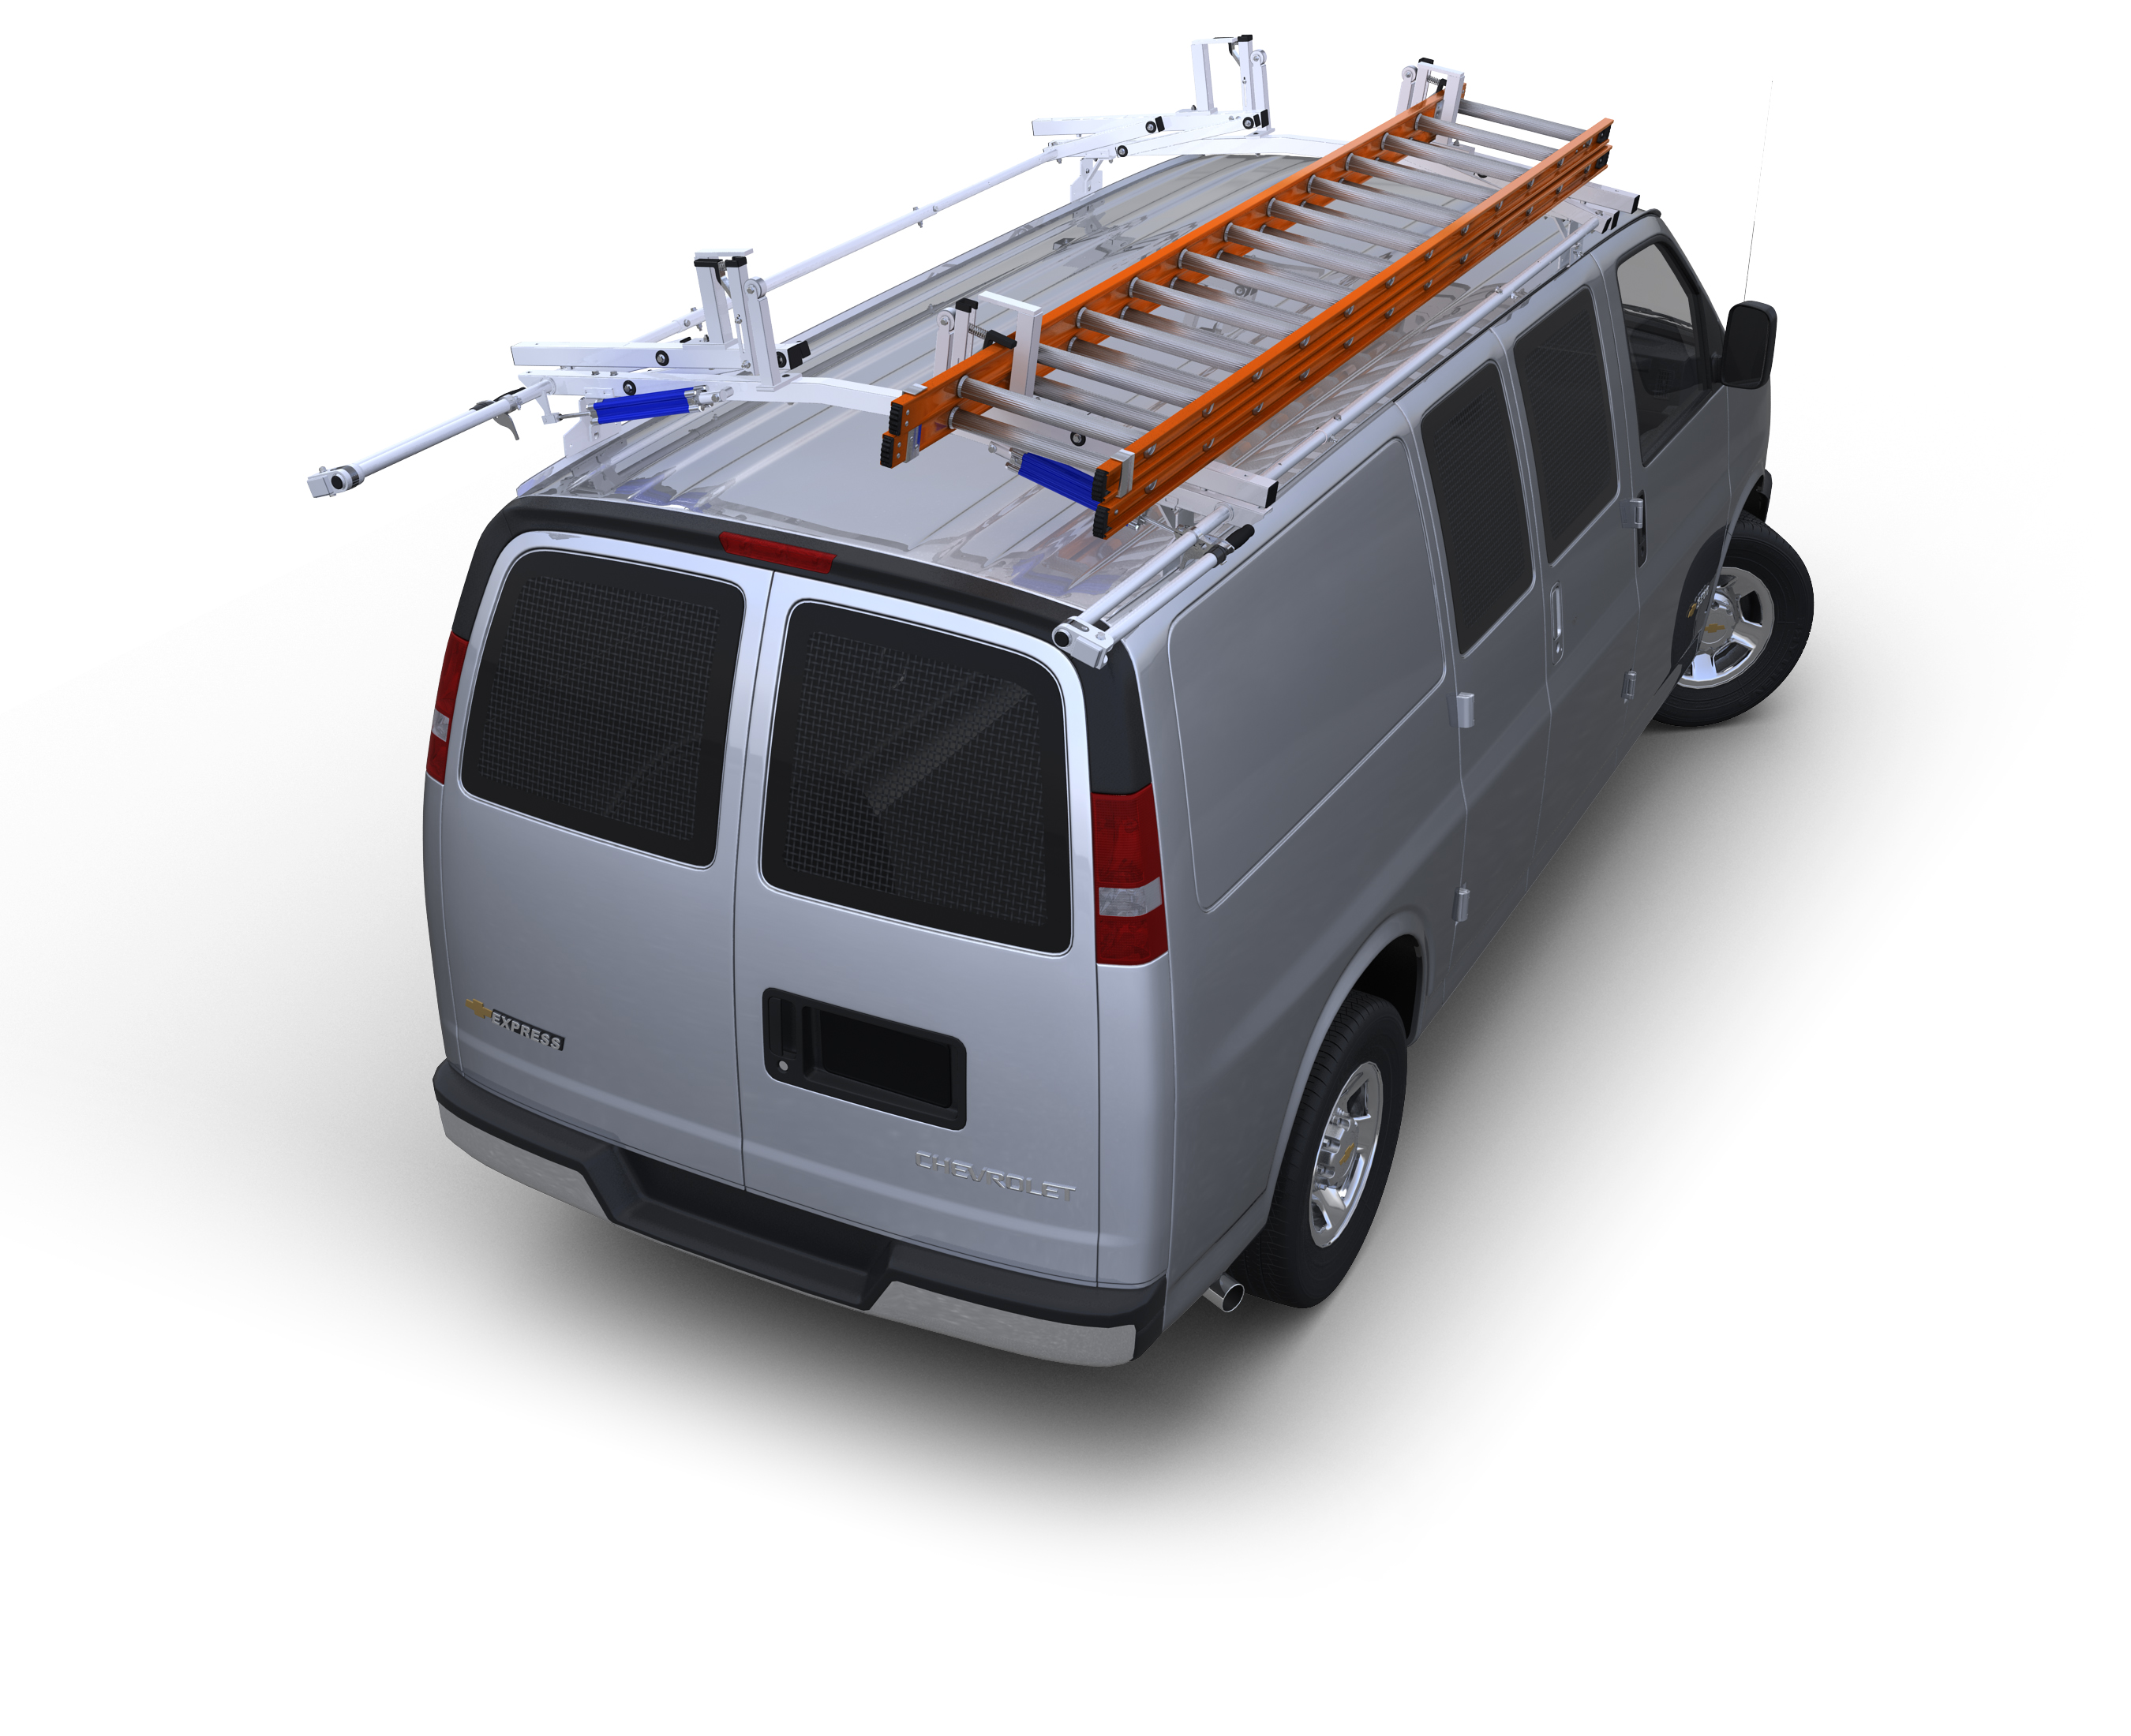 Electrician Van Package-Ford-2008 Or Newer